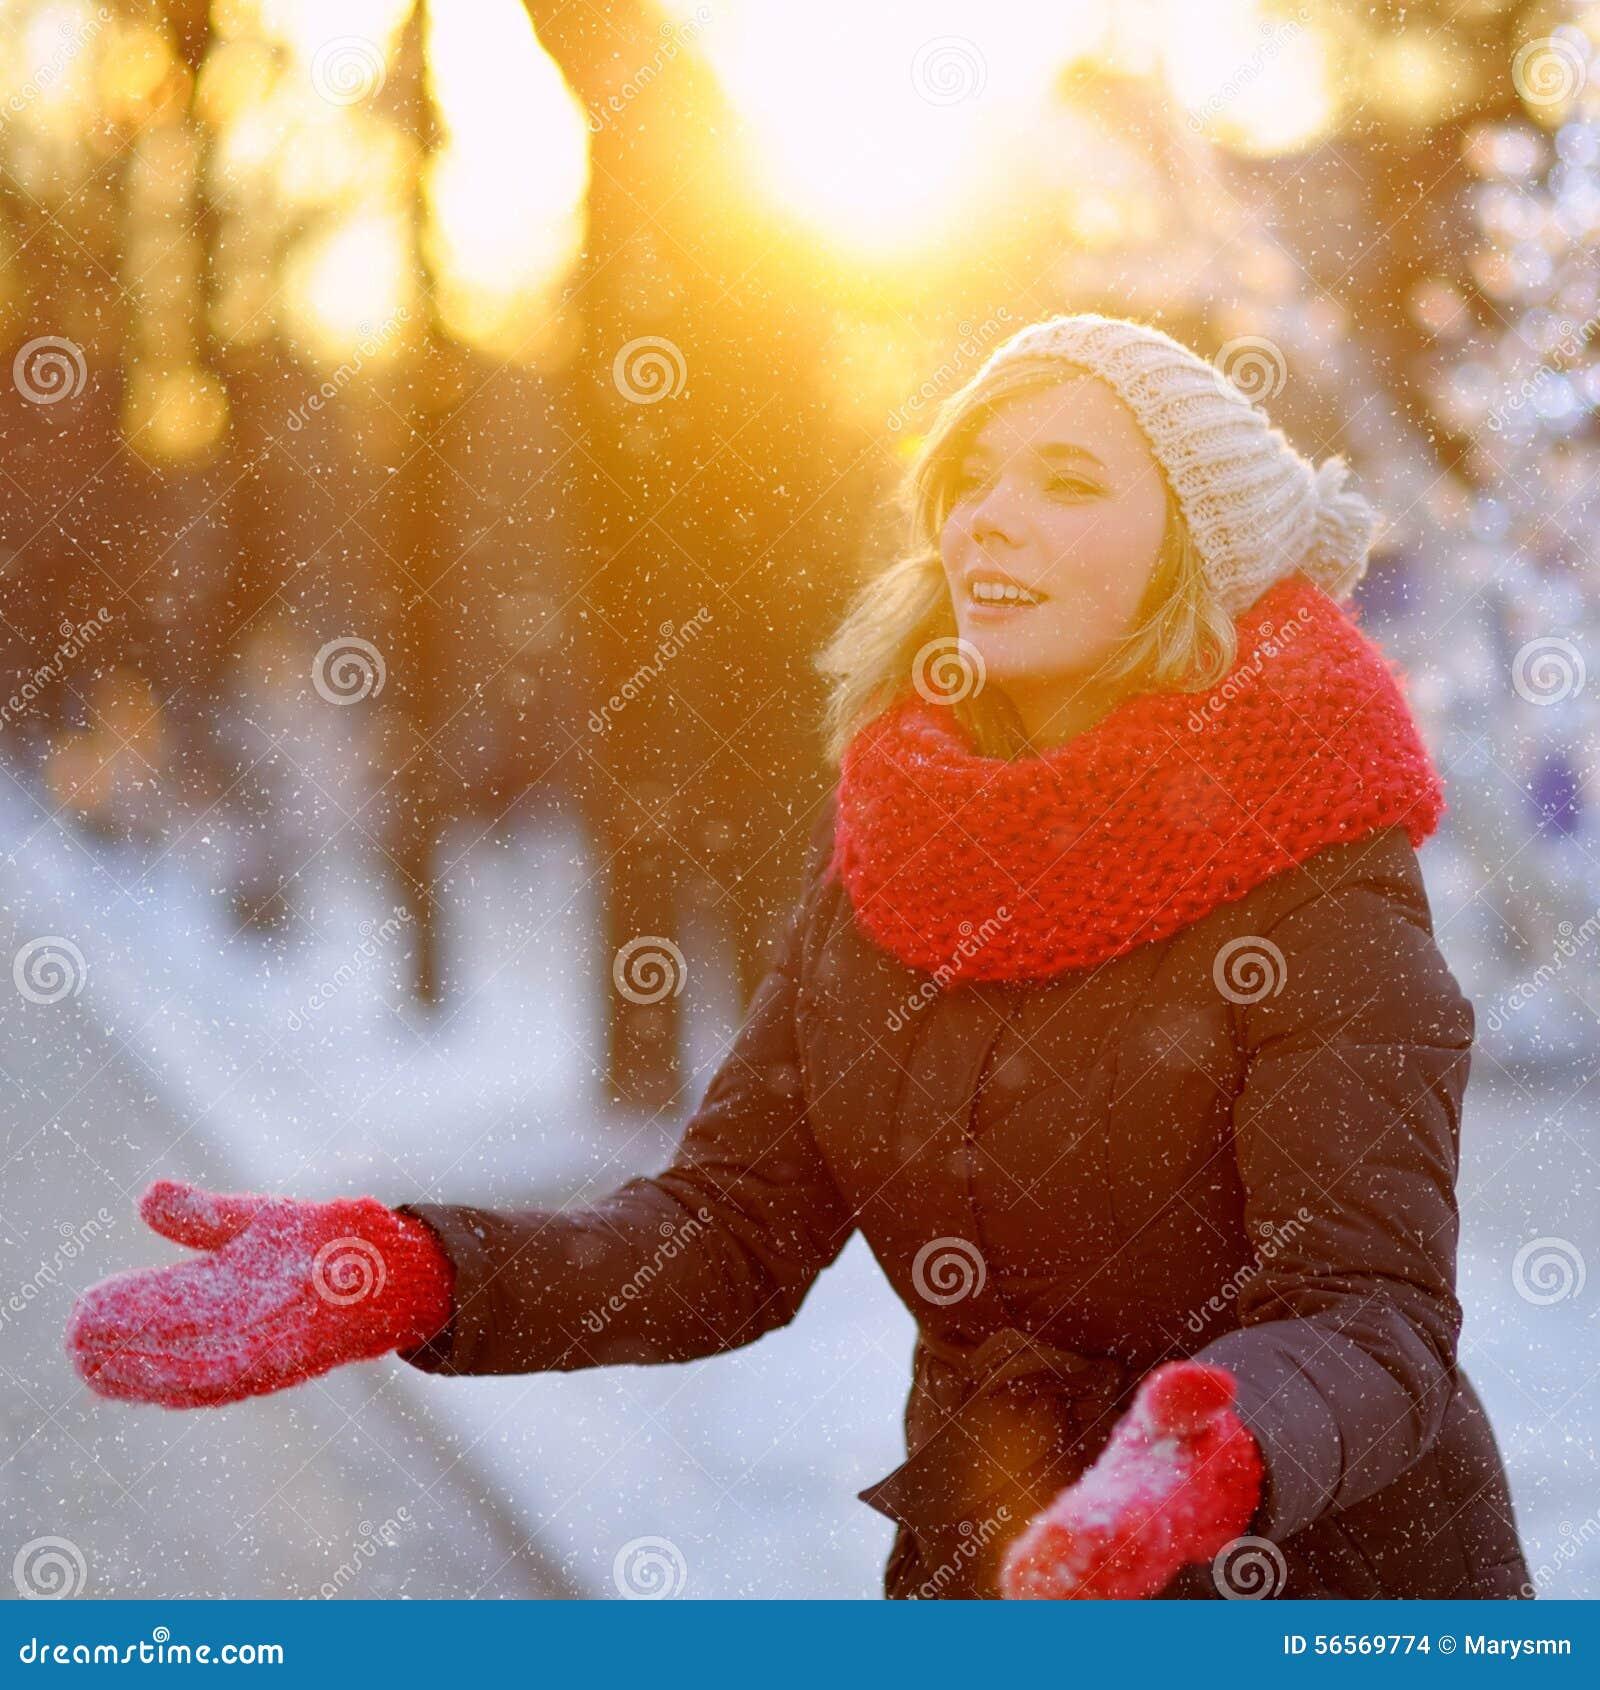 Download Νέα γυναίκα που έχει τη διασκέδαση το χειμώνα Στοκ Εικόνες - εικόνα από ευτυχής, μαντίλι: 56569774